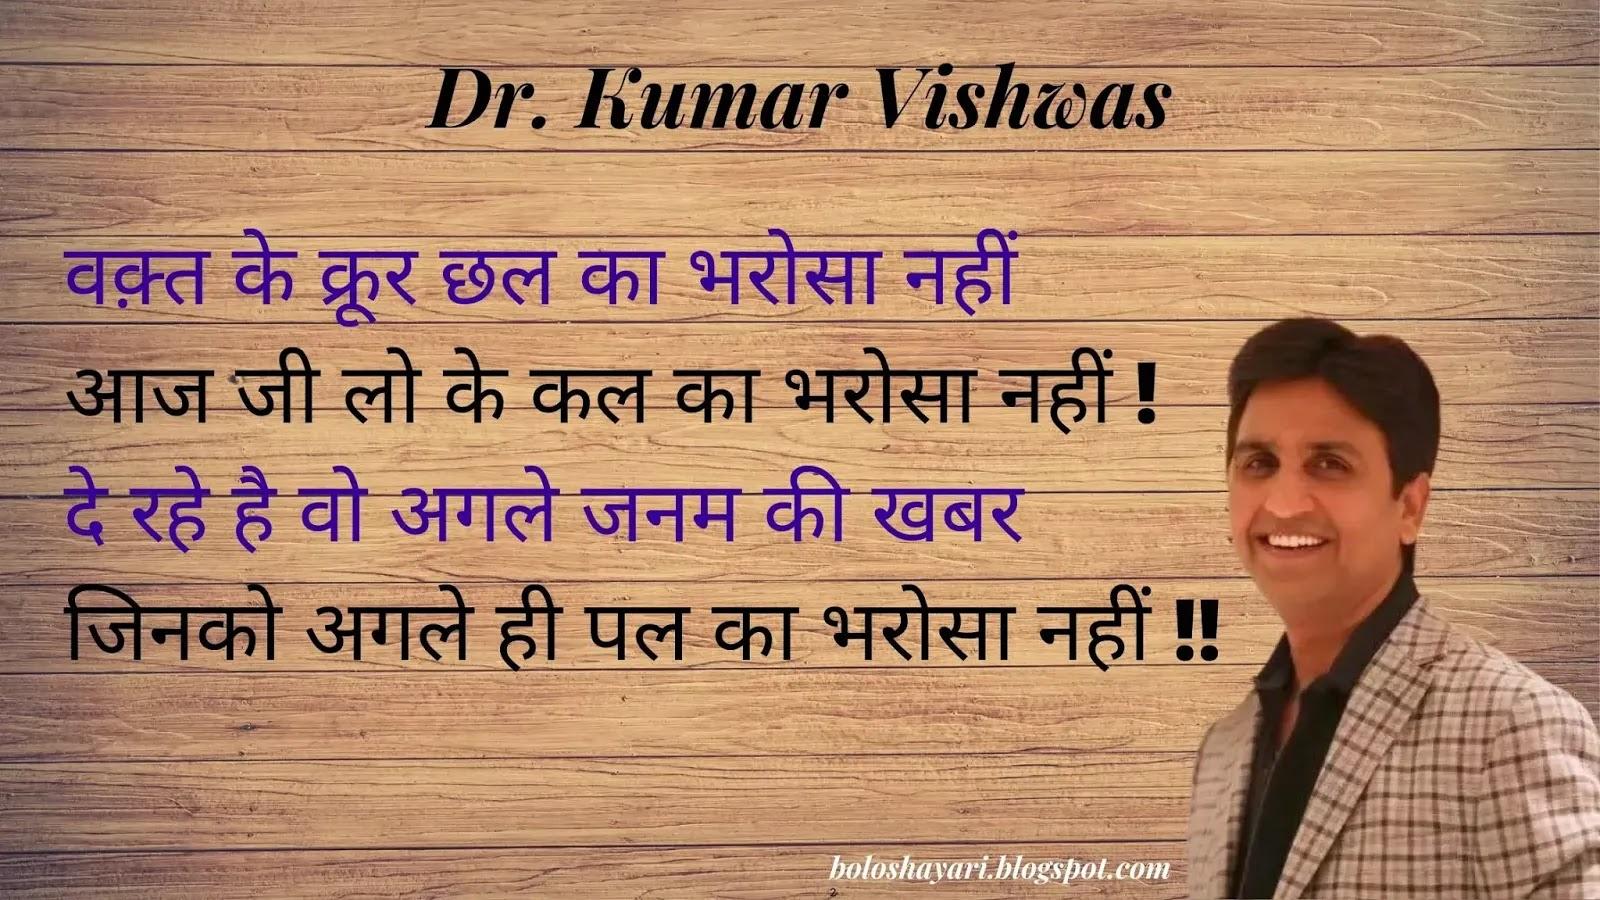 Kumar vishwas kavita dr kumar vishwas